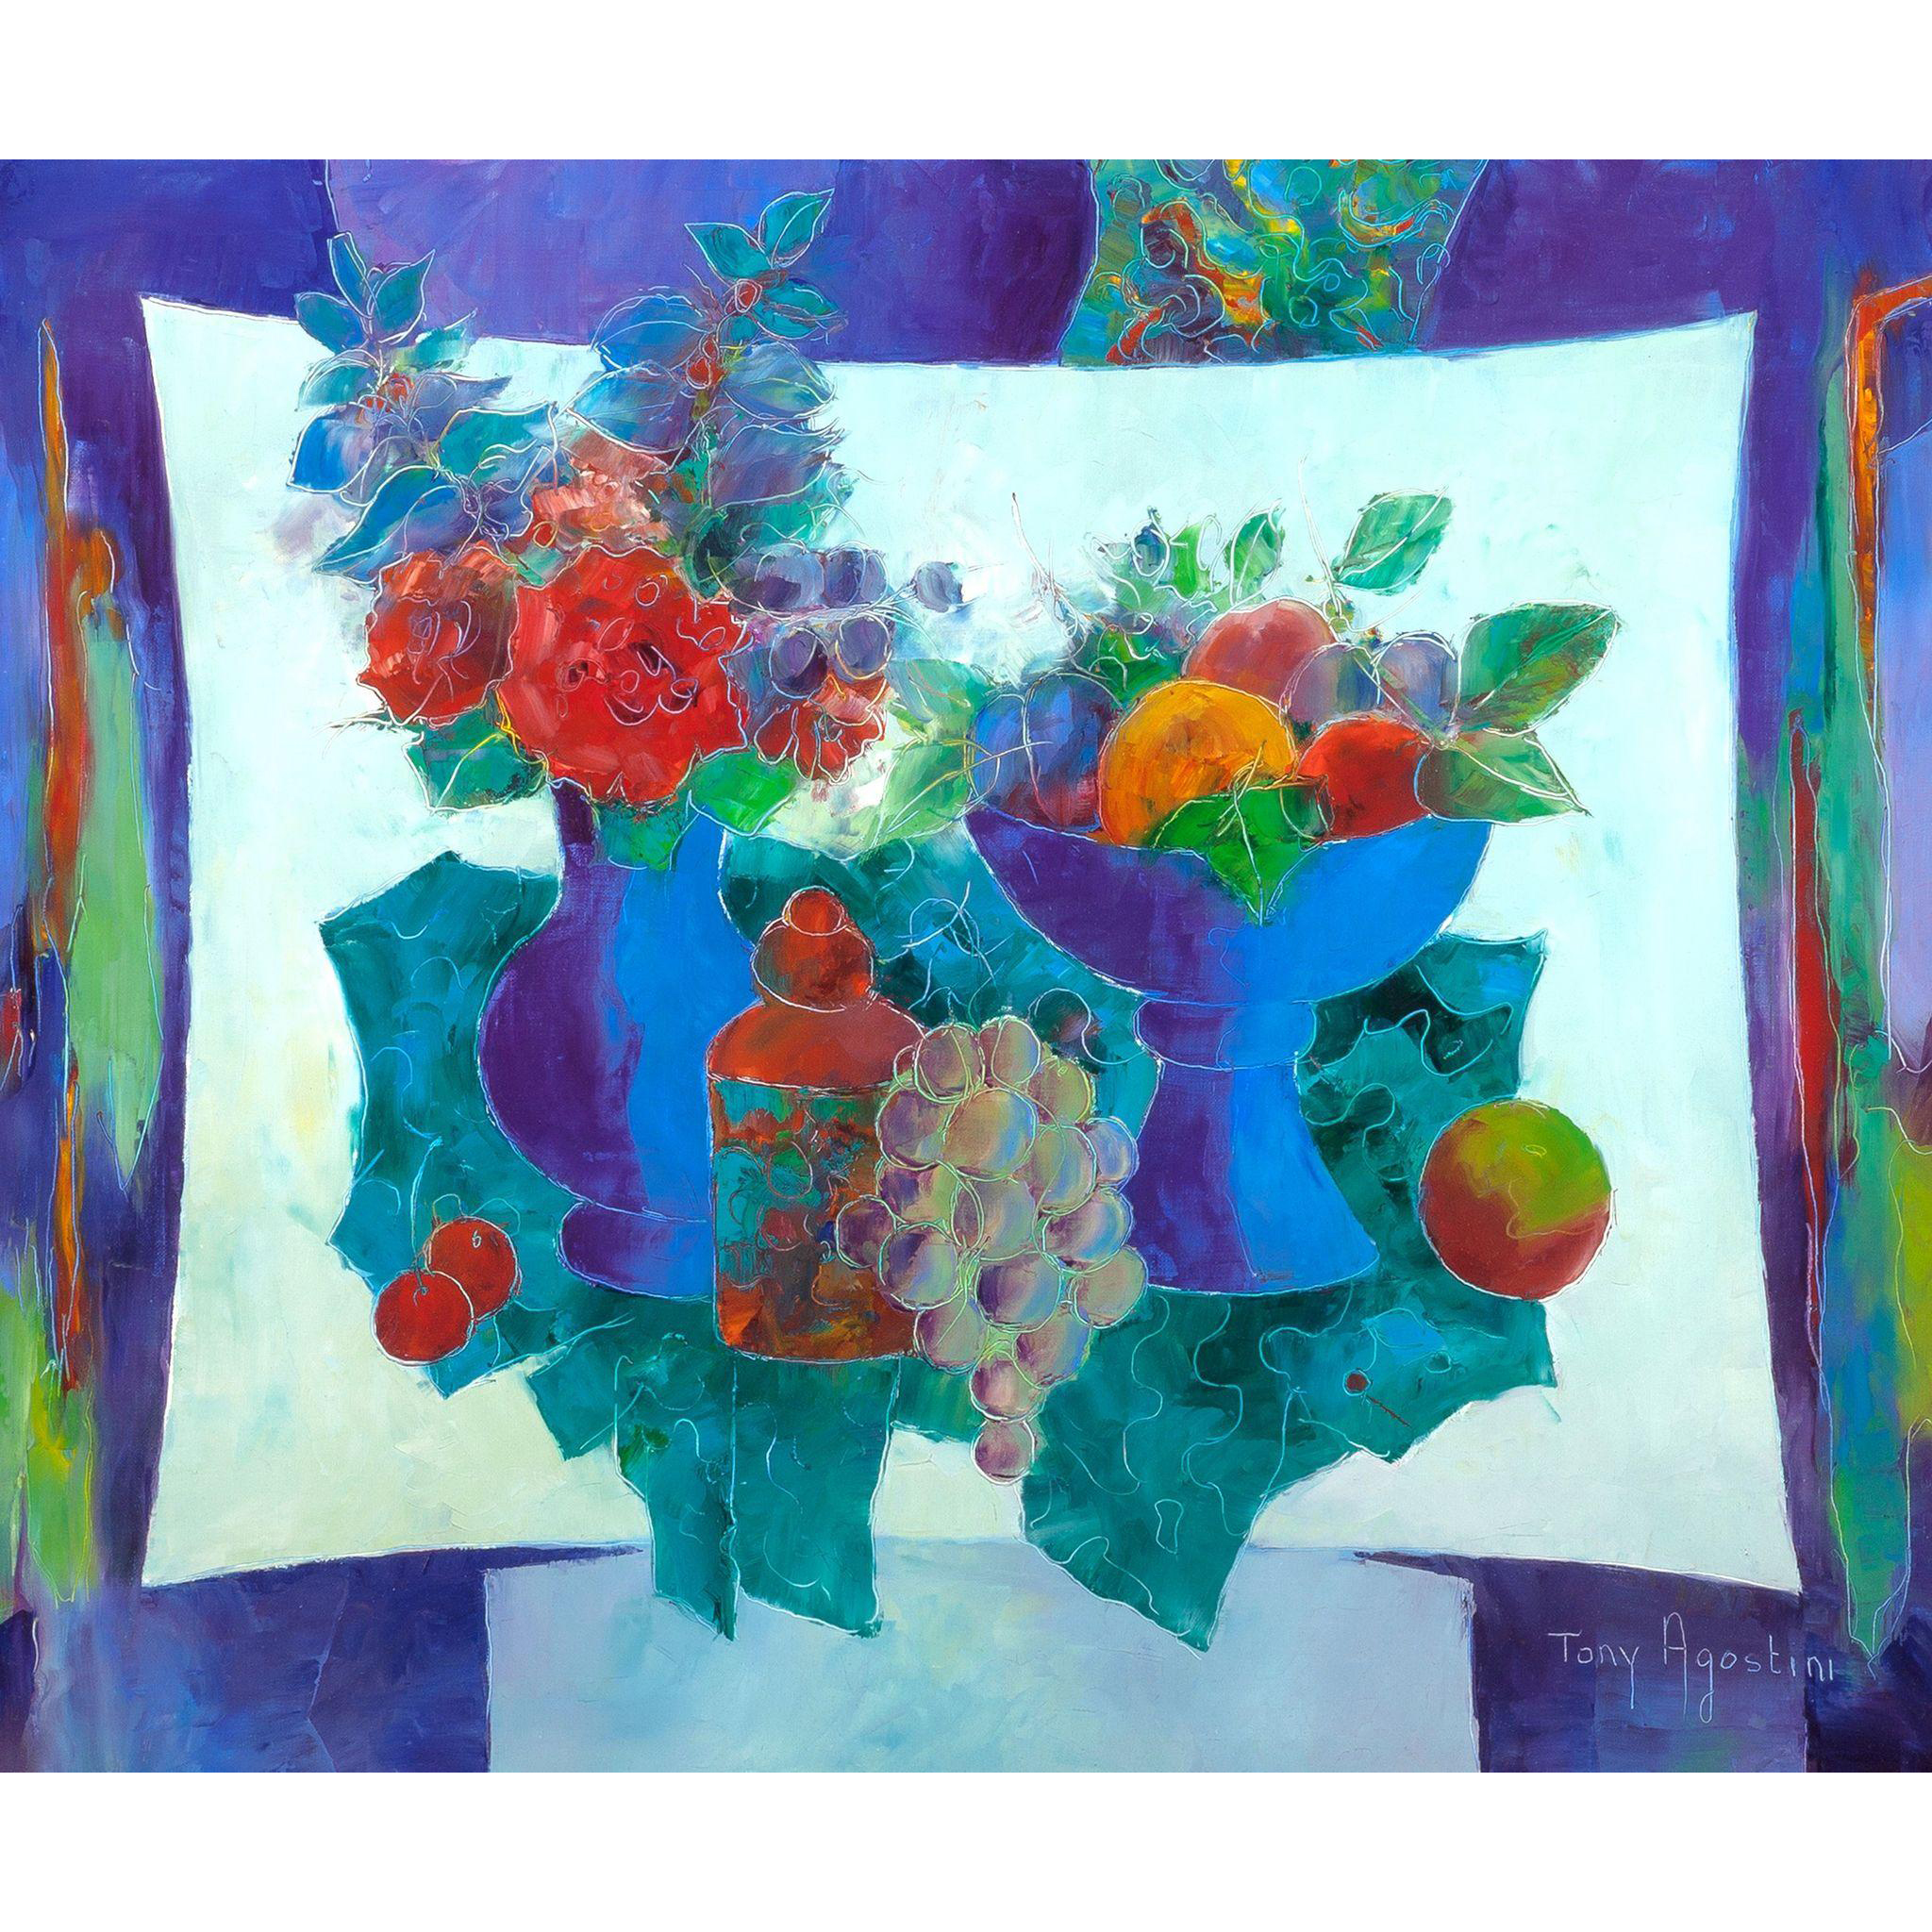 "TONY AGOSTINI (1916 - 1990) - Original Signed Oil On Canvas ""Vase Fleuri Et Coupe De Fruits"" Still Life Modernist Artwork"